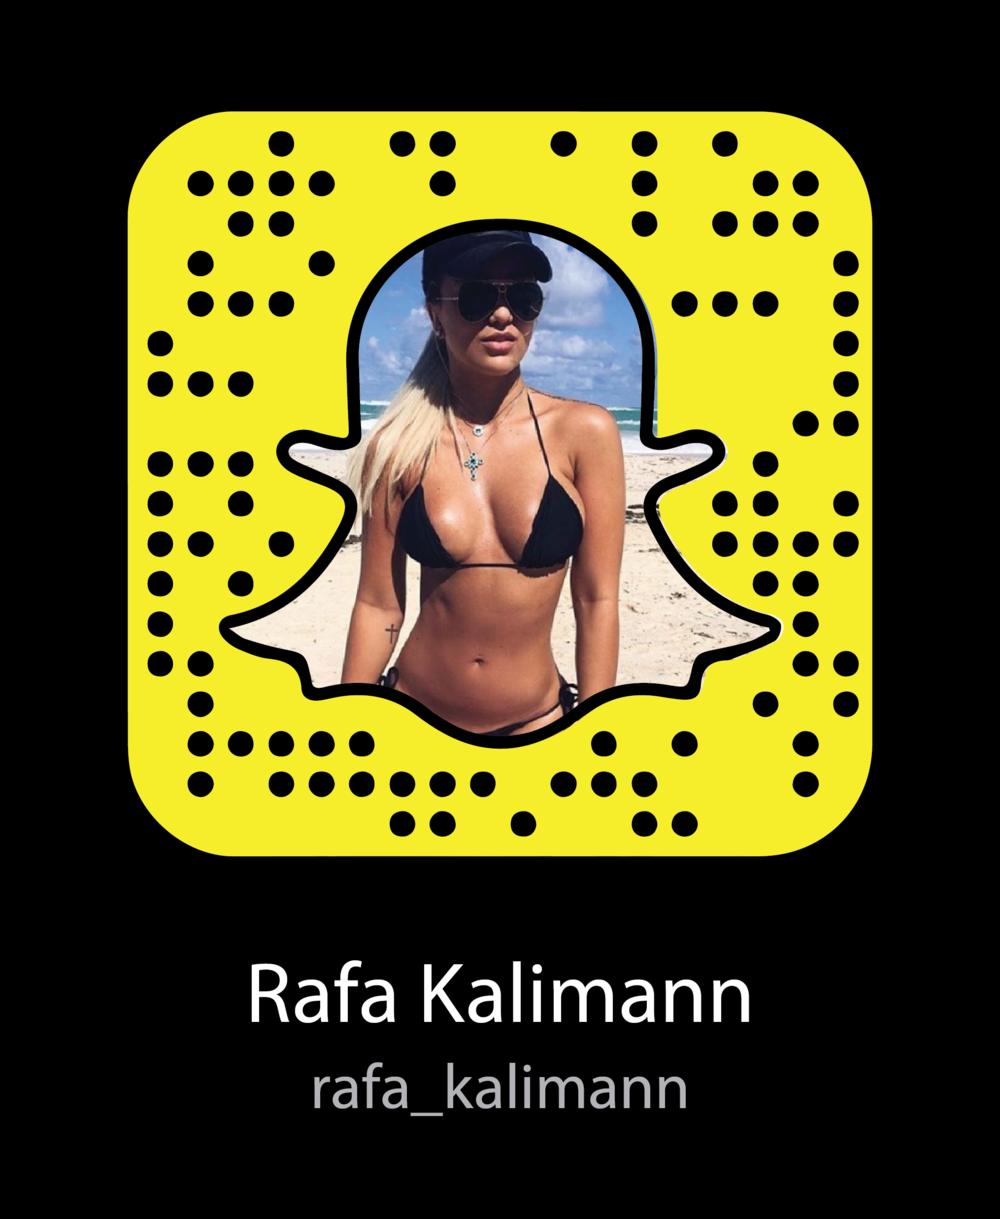 rafa_kalimann-Sexy-snapchat-snapcode.png